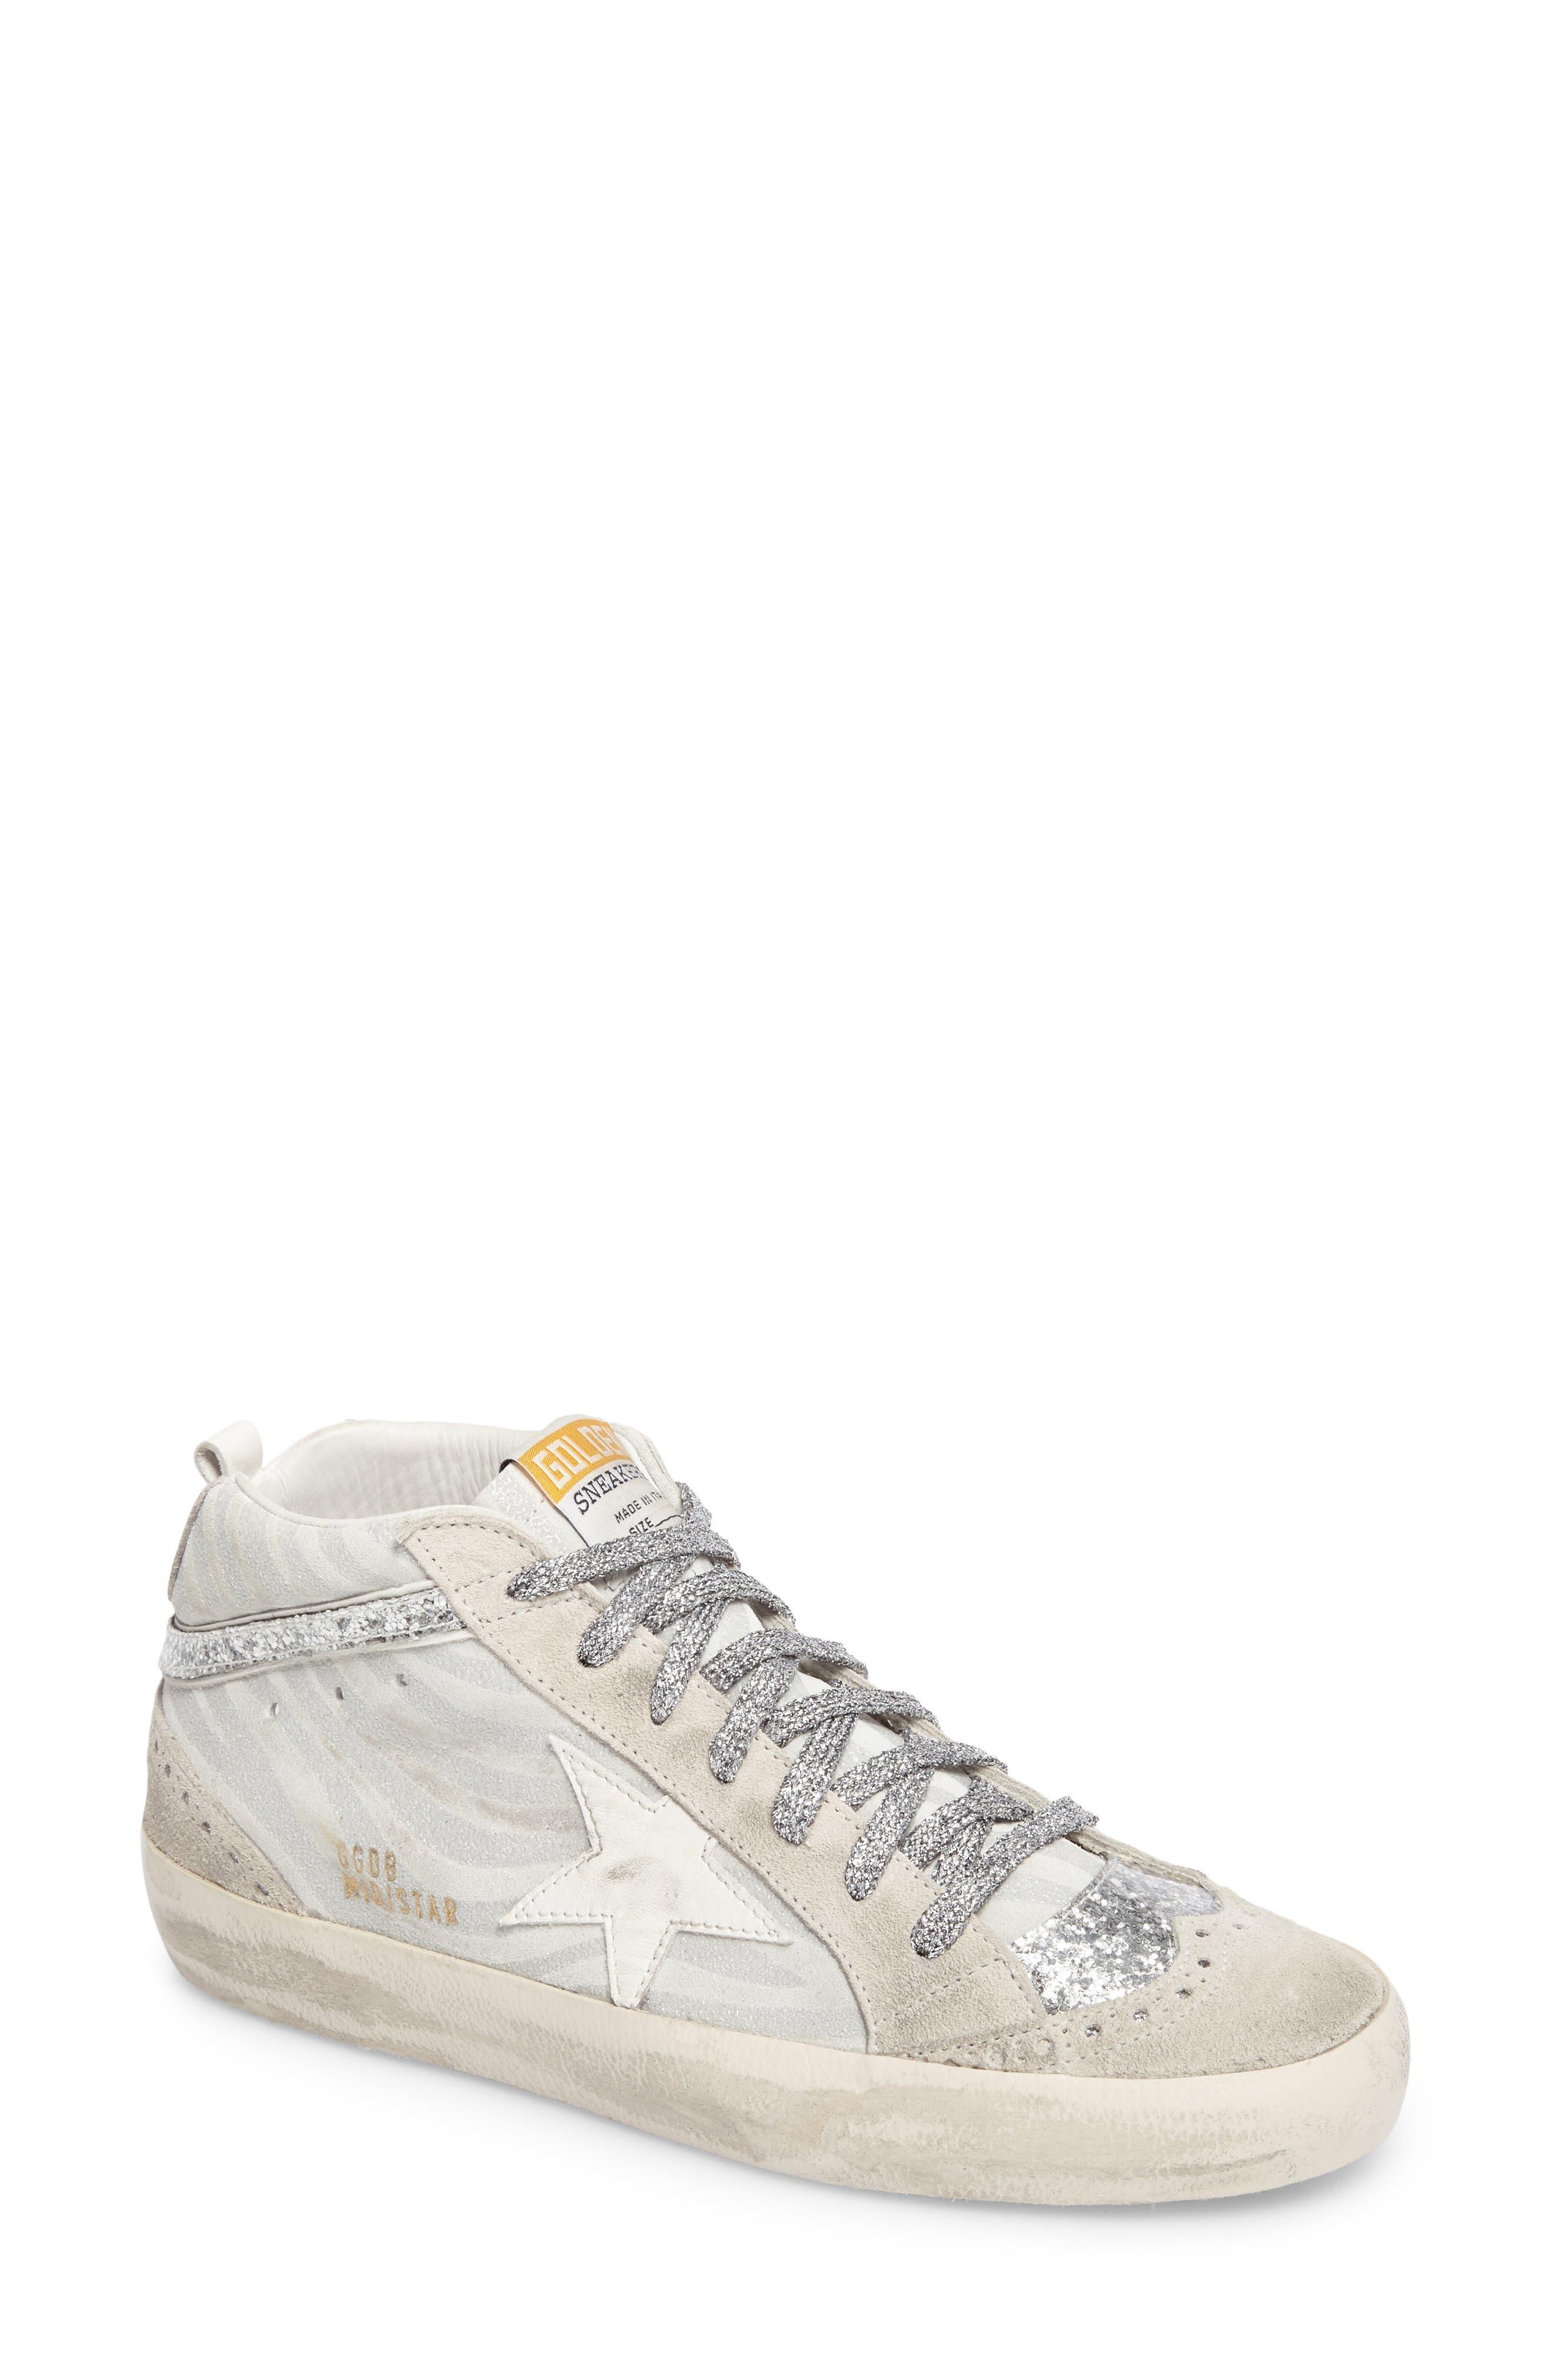 Star Mid Top Sneaker,                             Main thumbnail 1, color,                             White Zebra